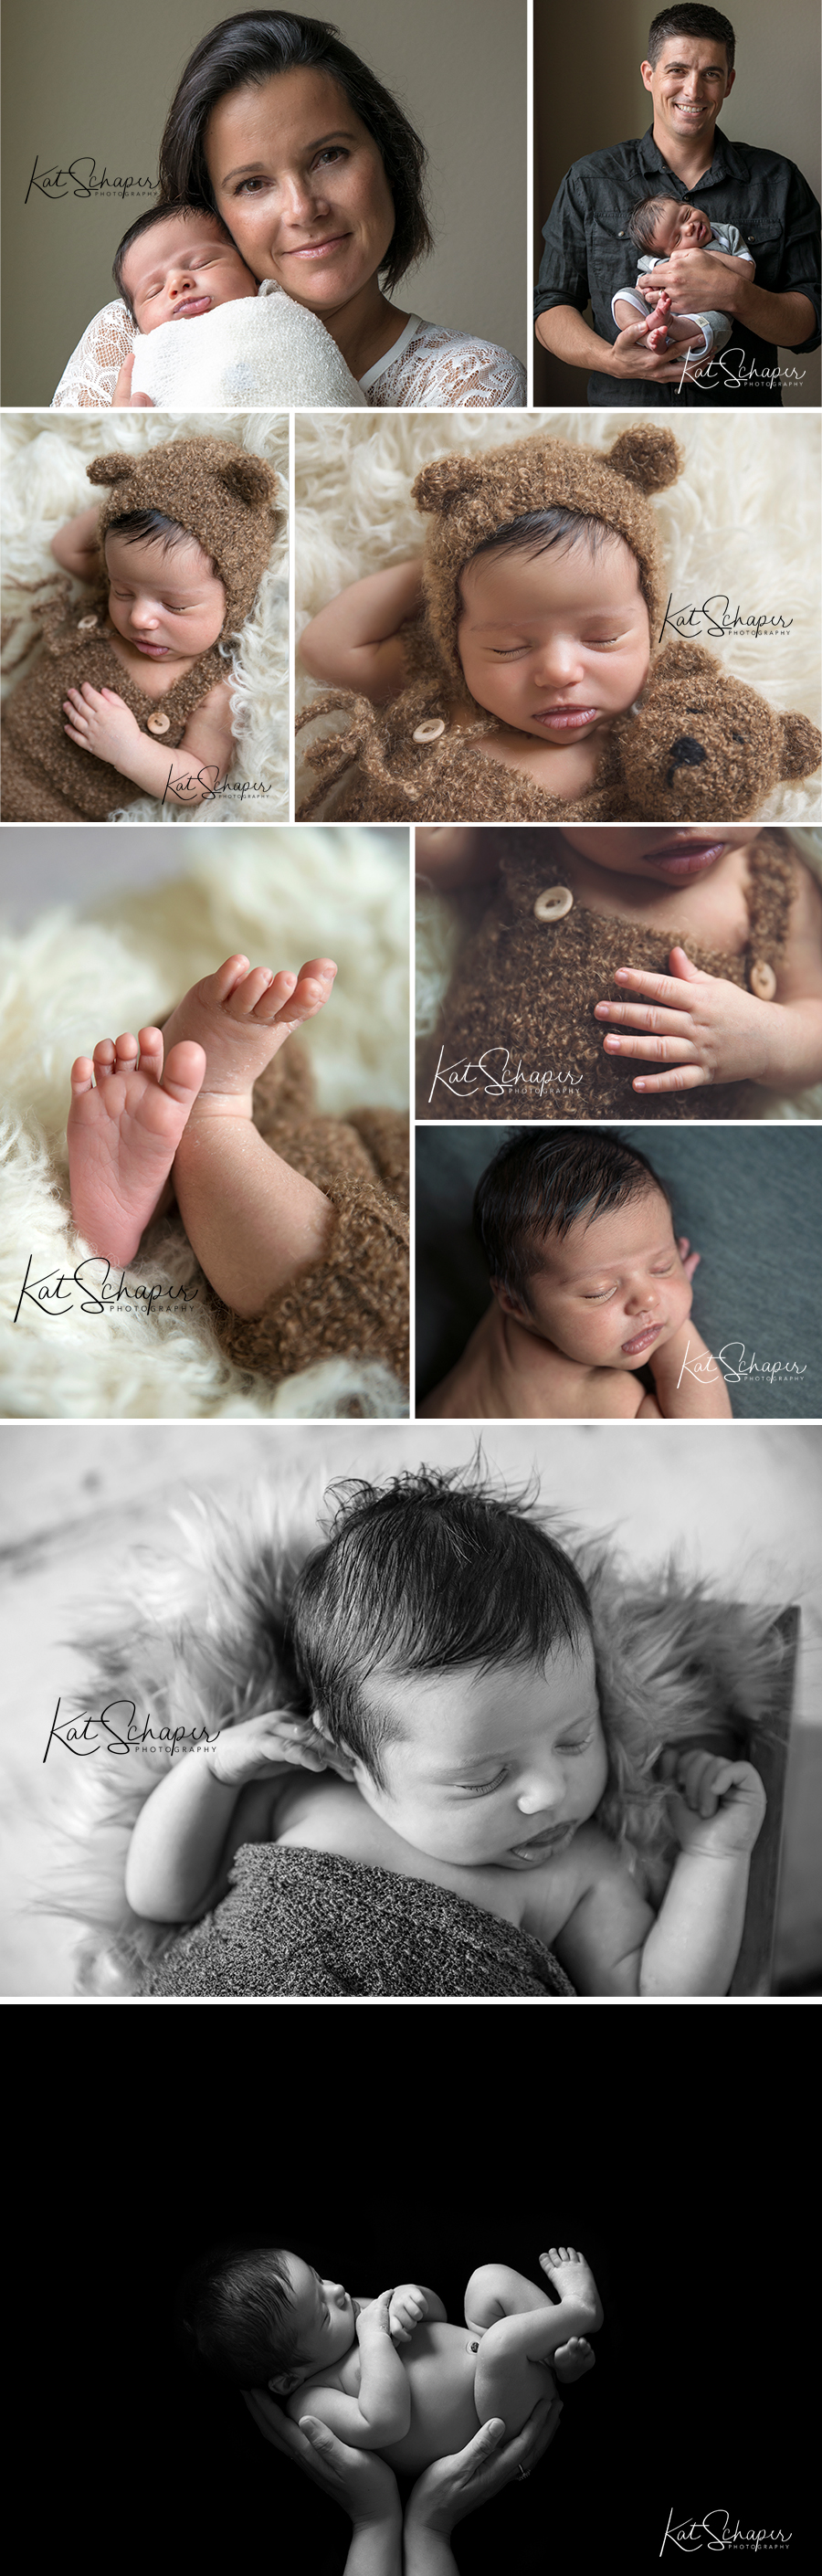 katschaperphotography.newborn.joseph.jpg